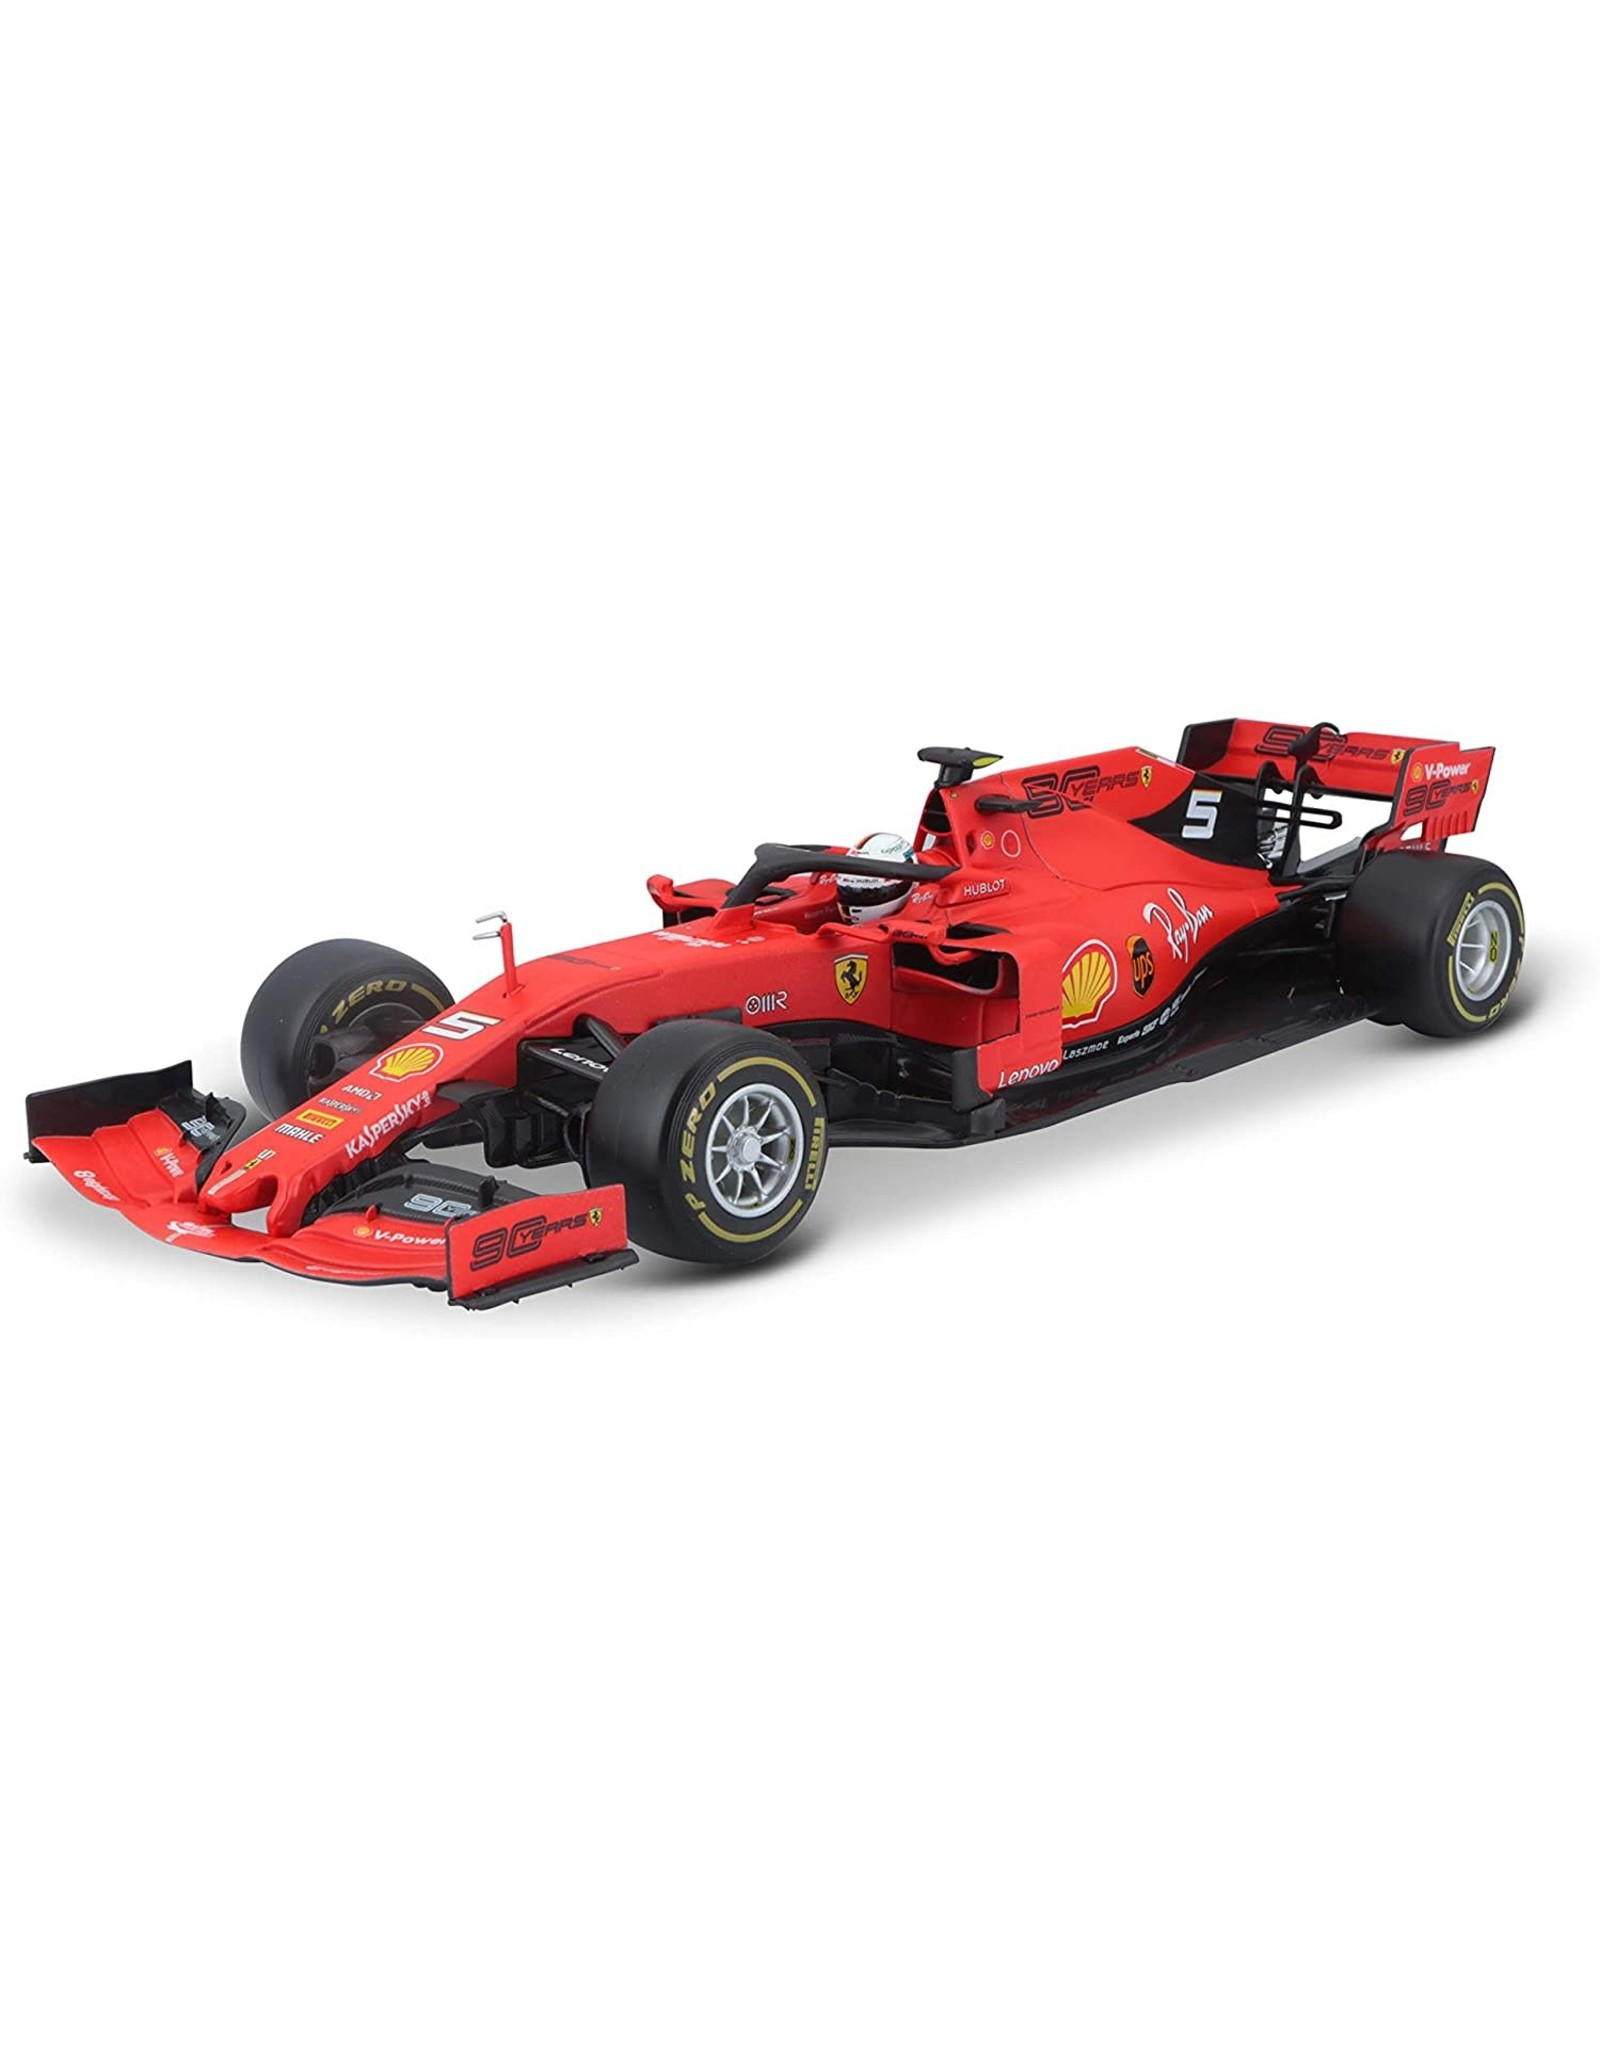 Burago F1 1:18 Ferrari SF90 S. Vettel